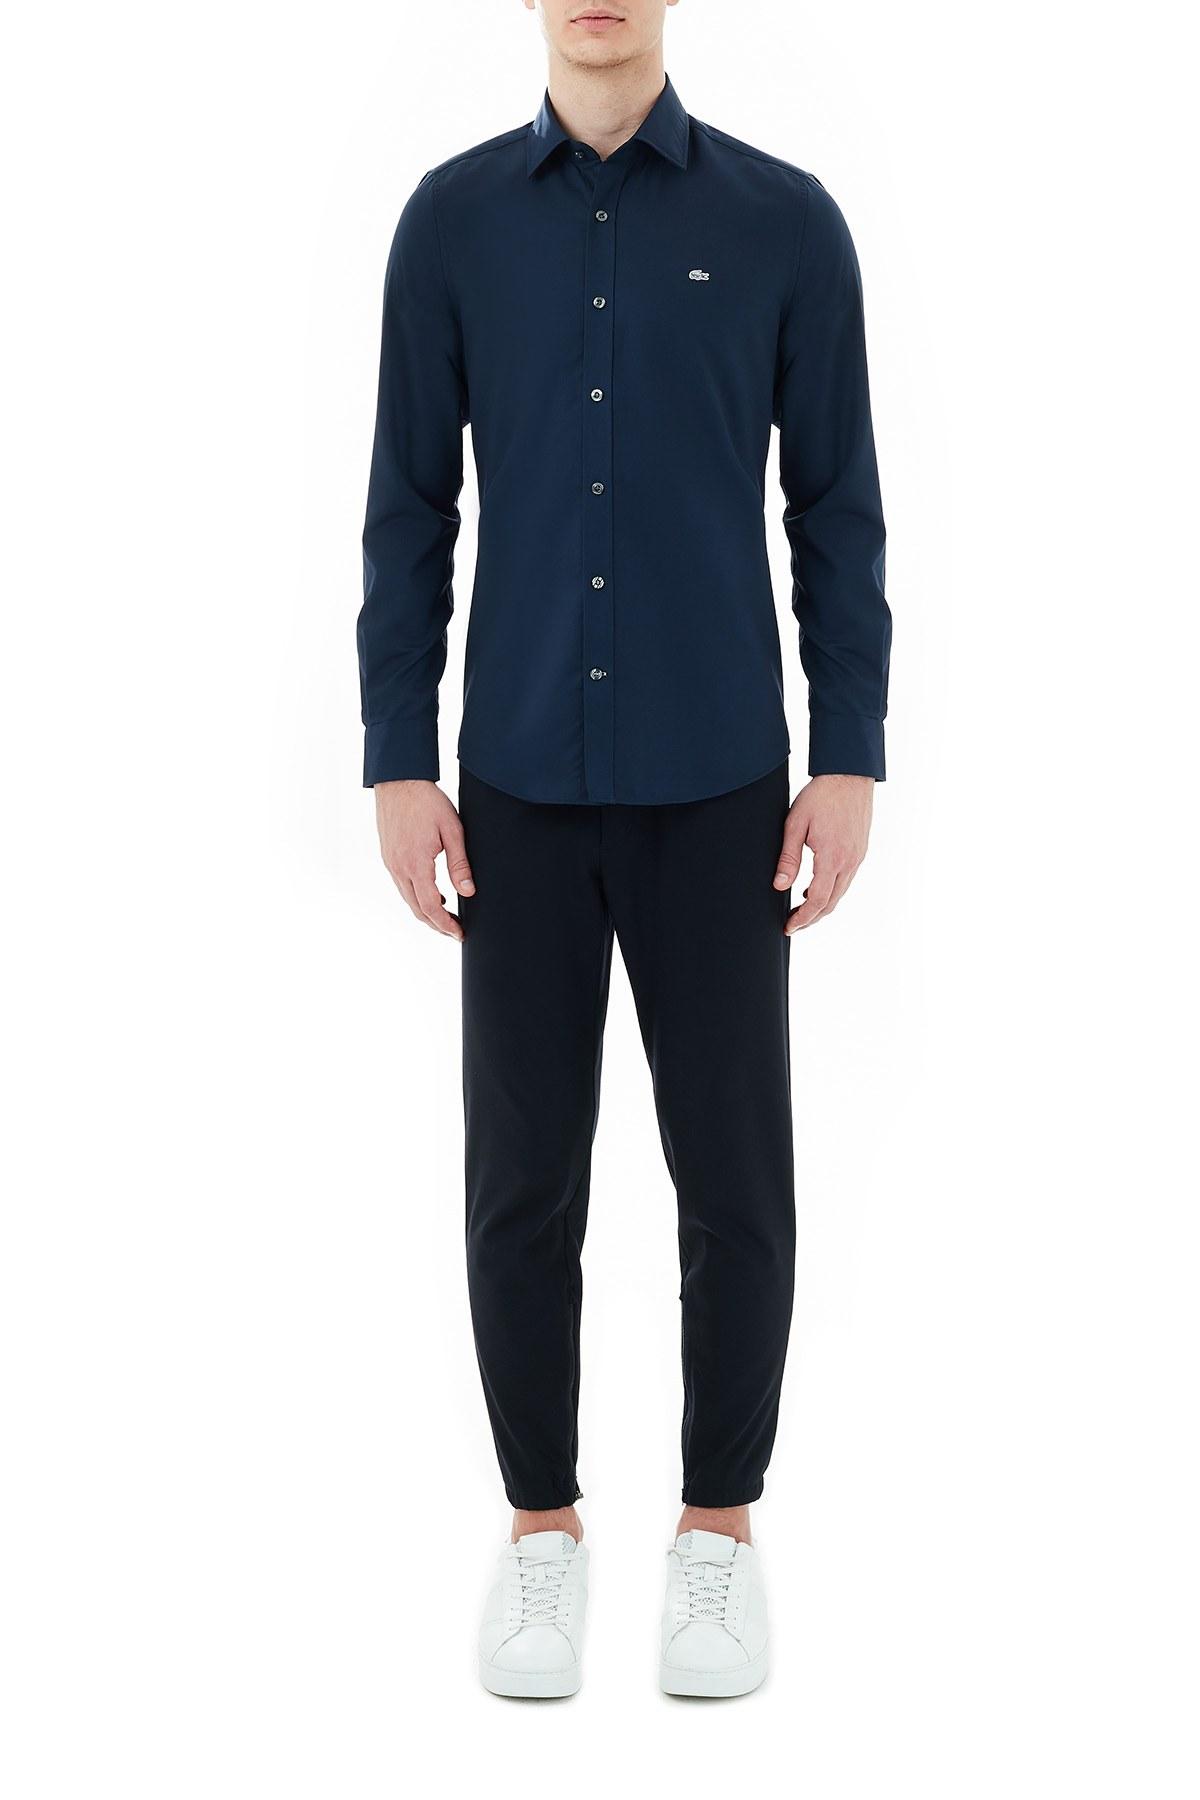 Lacoste Slim Fit Düz Yaka % 100 Pamuk Erkek Gömlek CH6122 423 LACİVERT